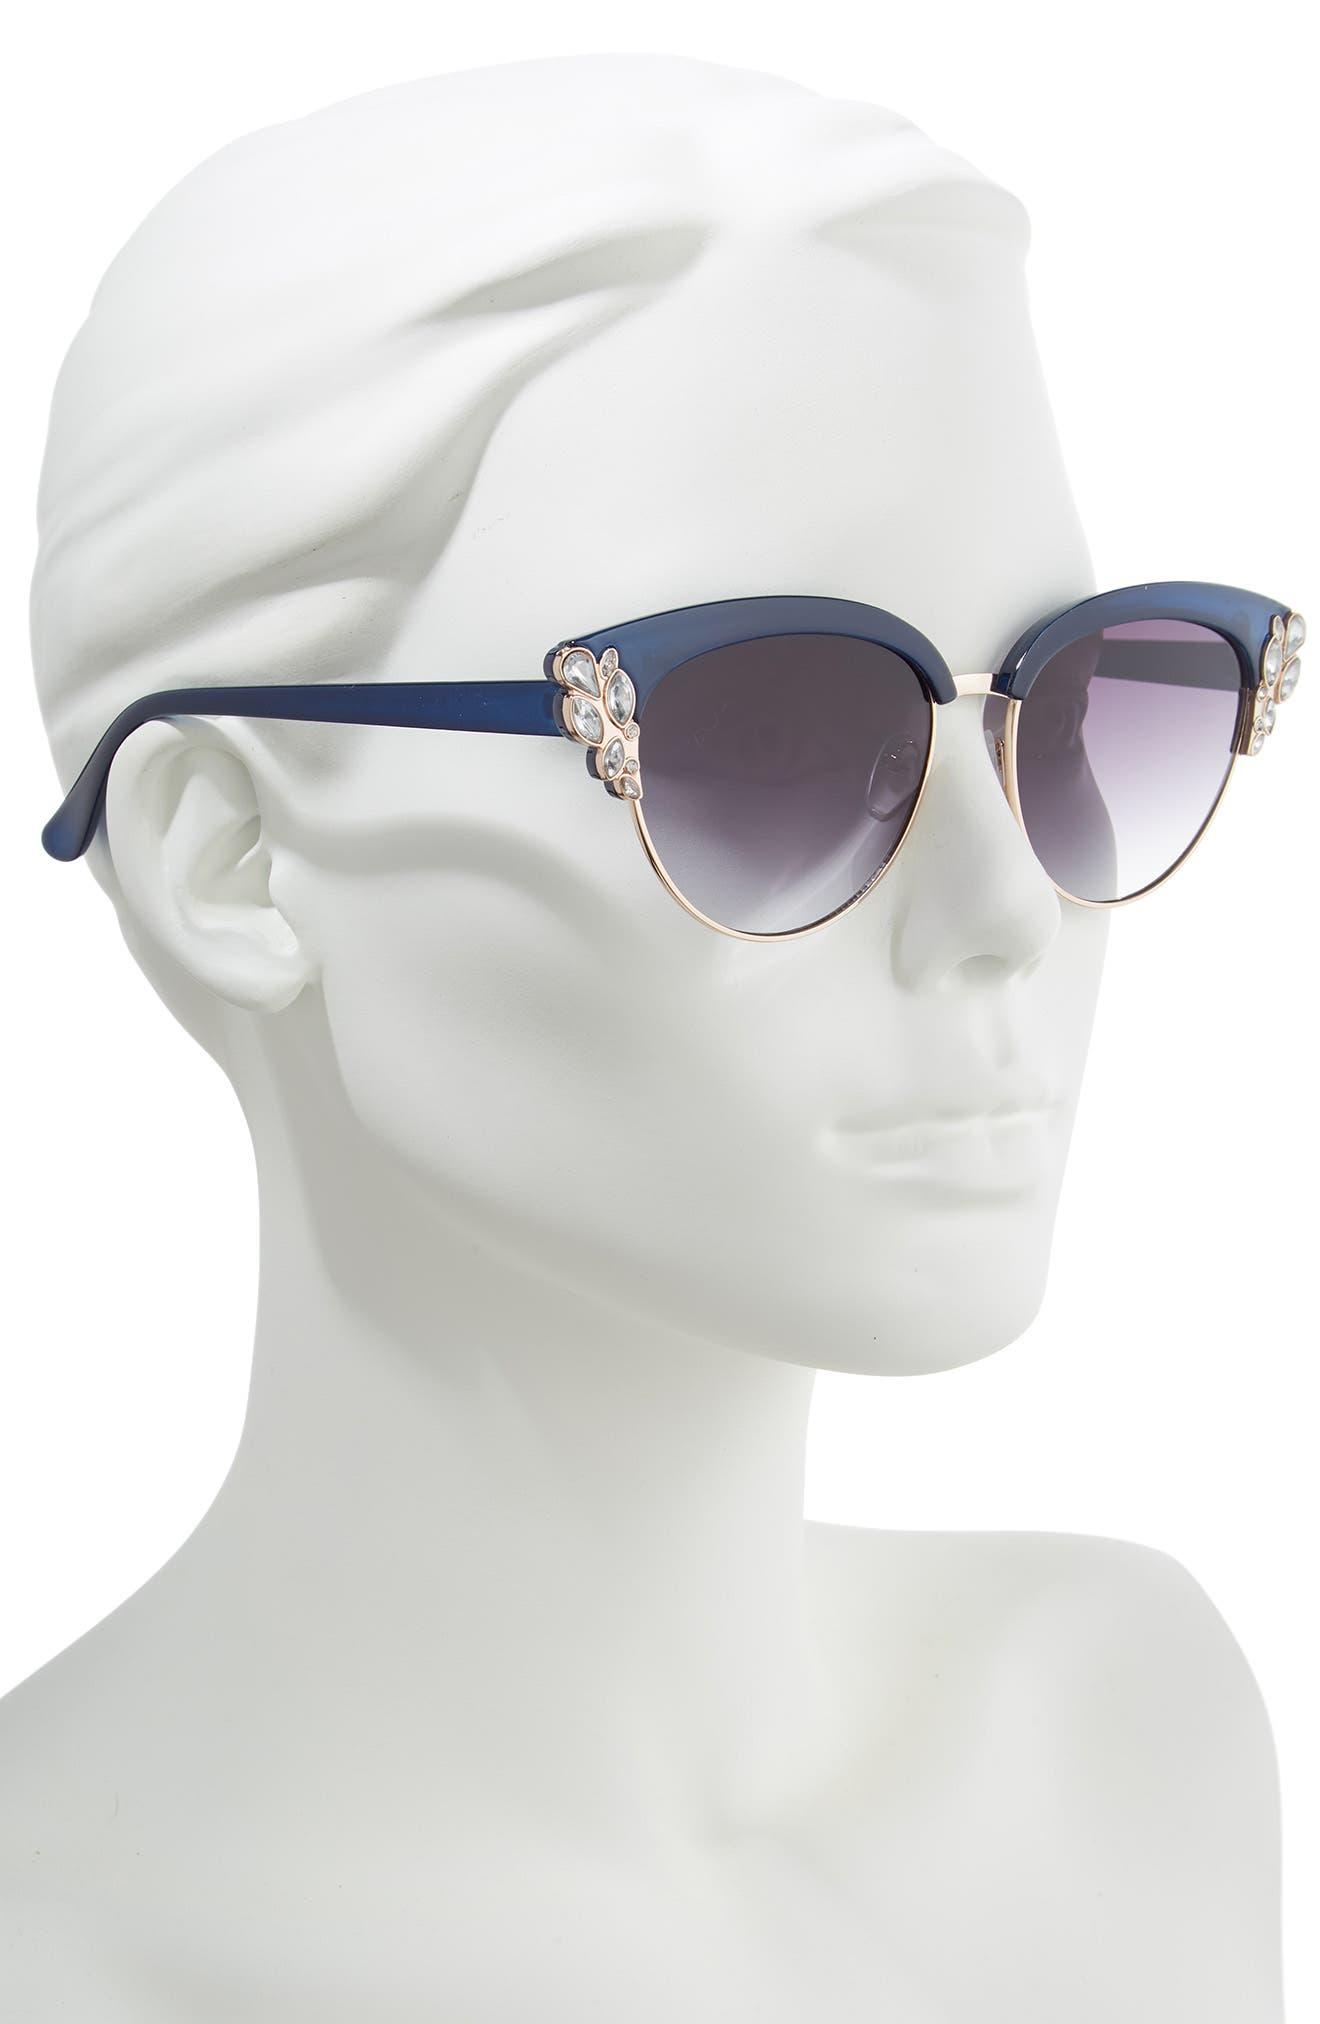 58mm Embellished Cat Eye Sunglasses,                             Alternate thumbnail 2, color,                             BLUE/ GOLD